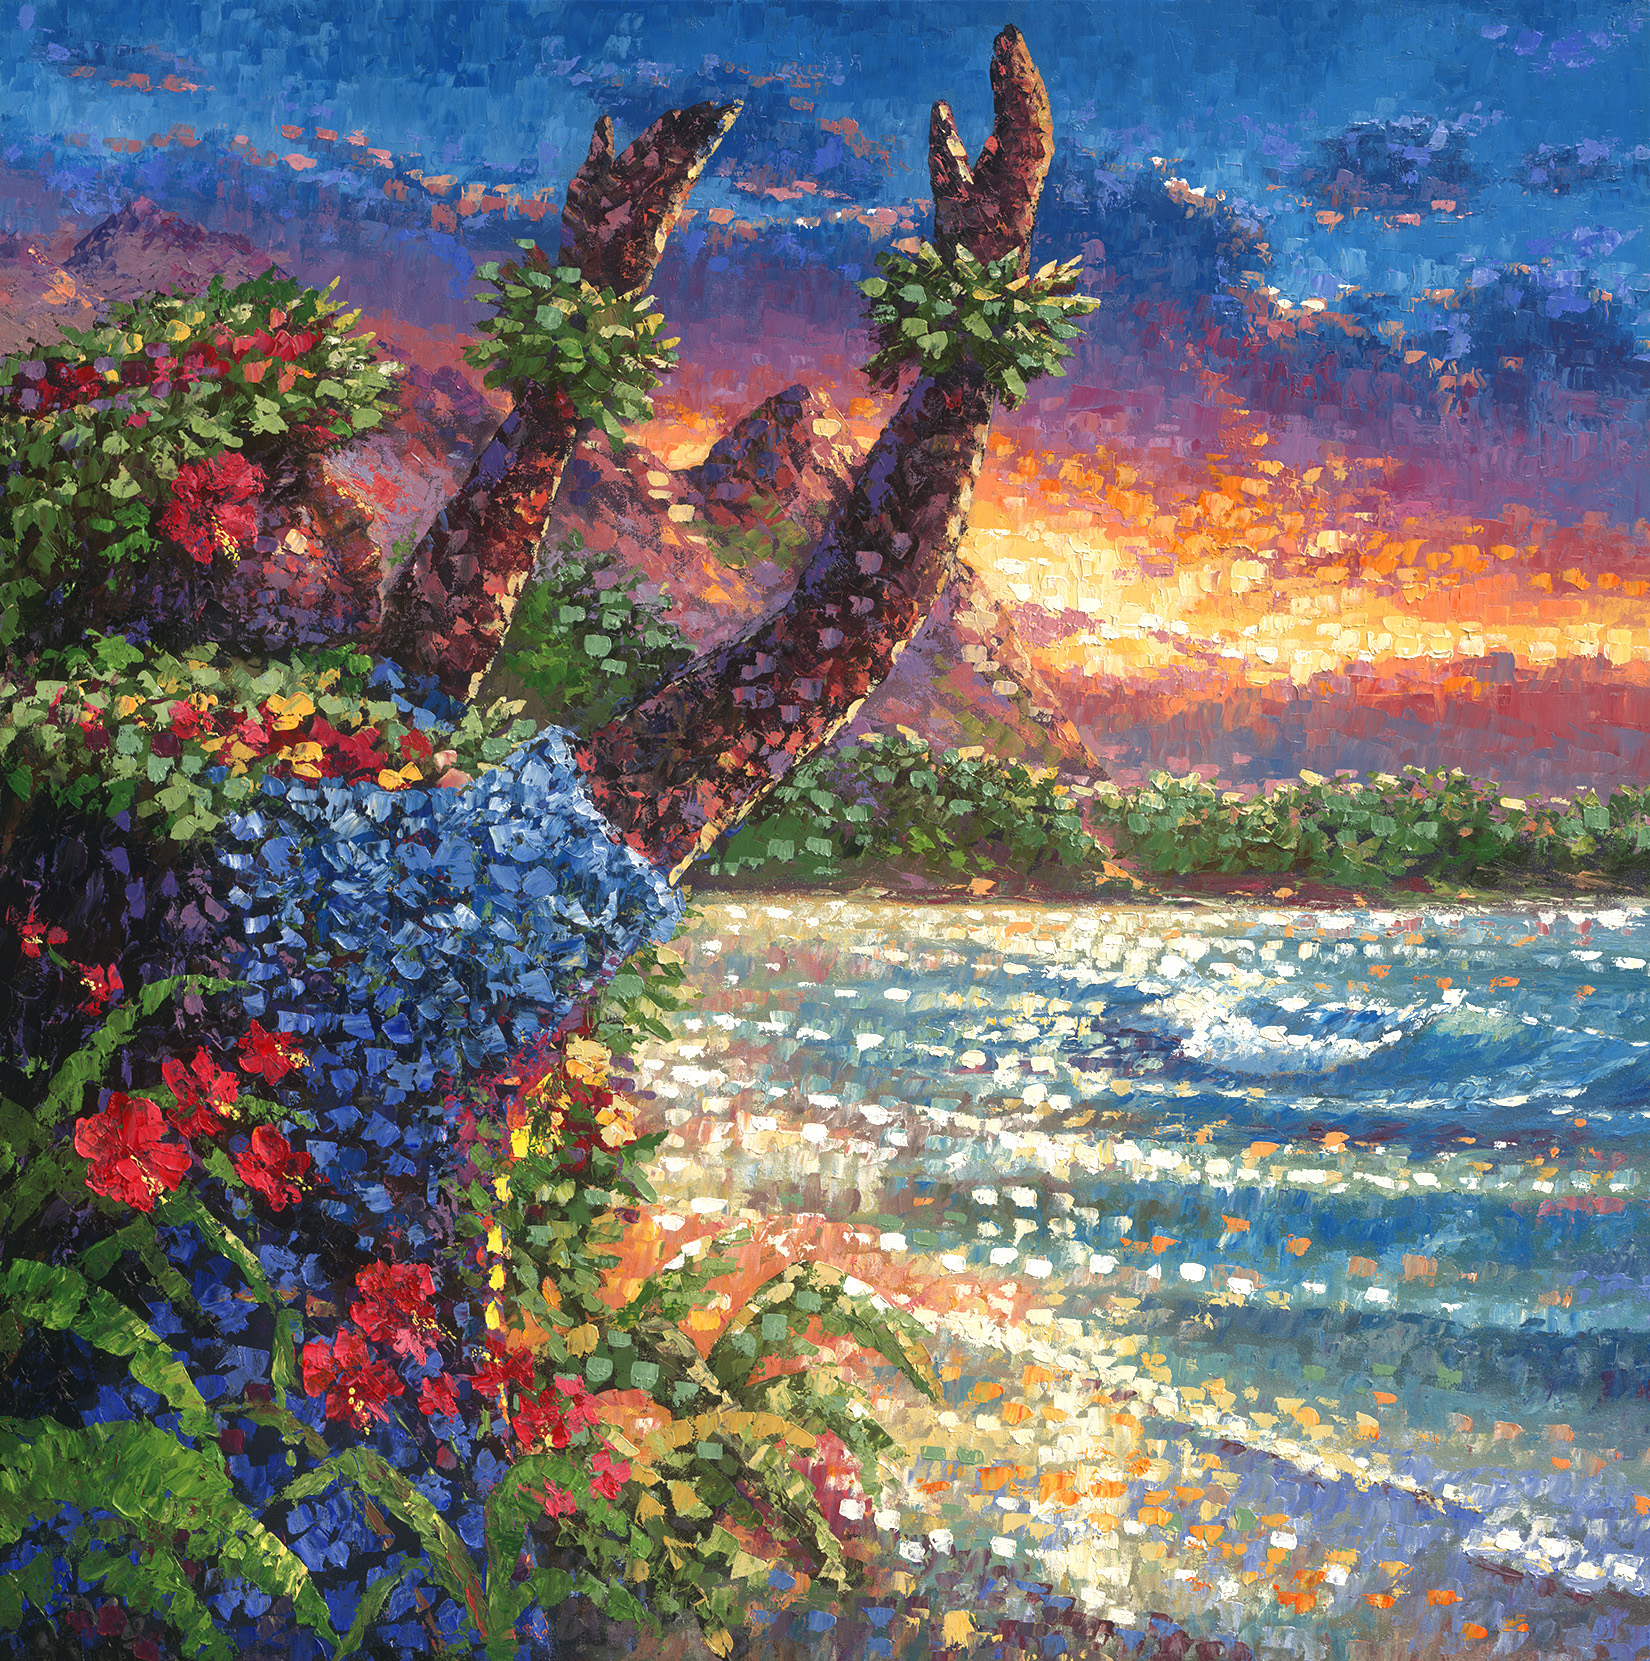 """Bali Hai Hula"" 36x36"